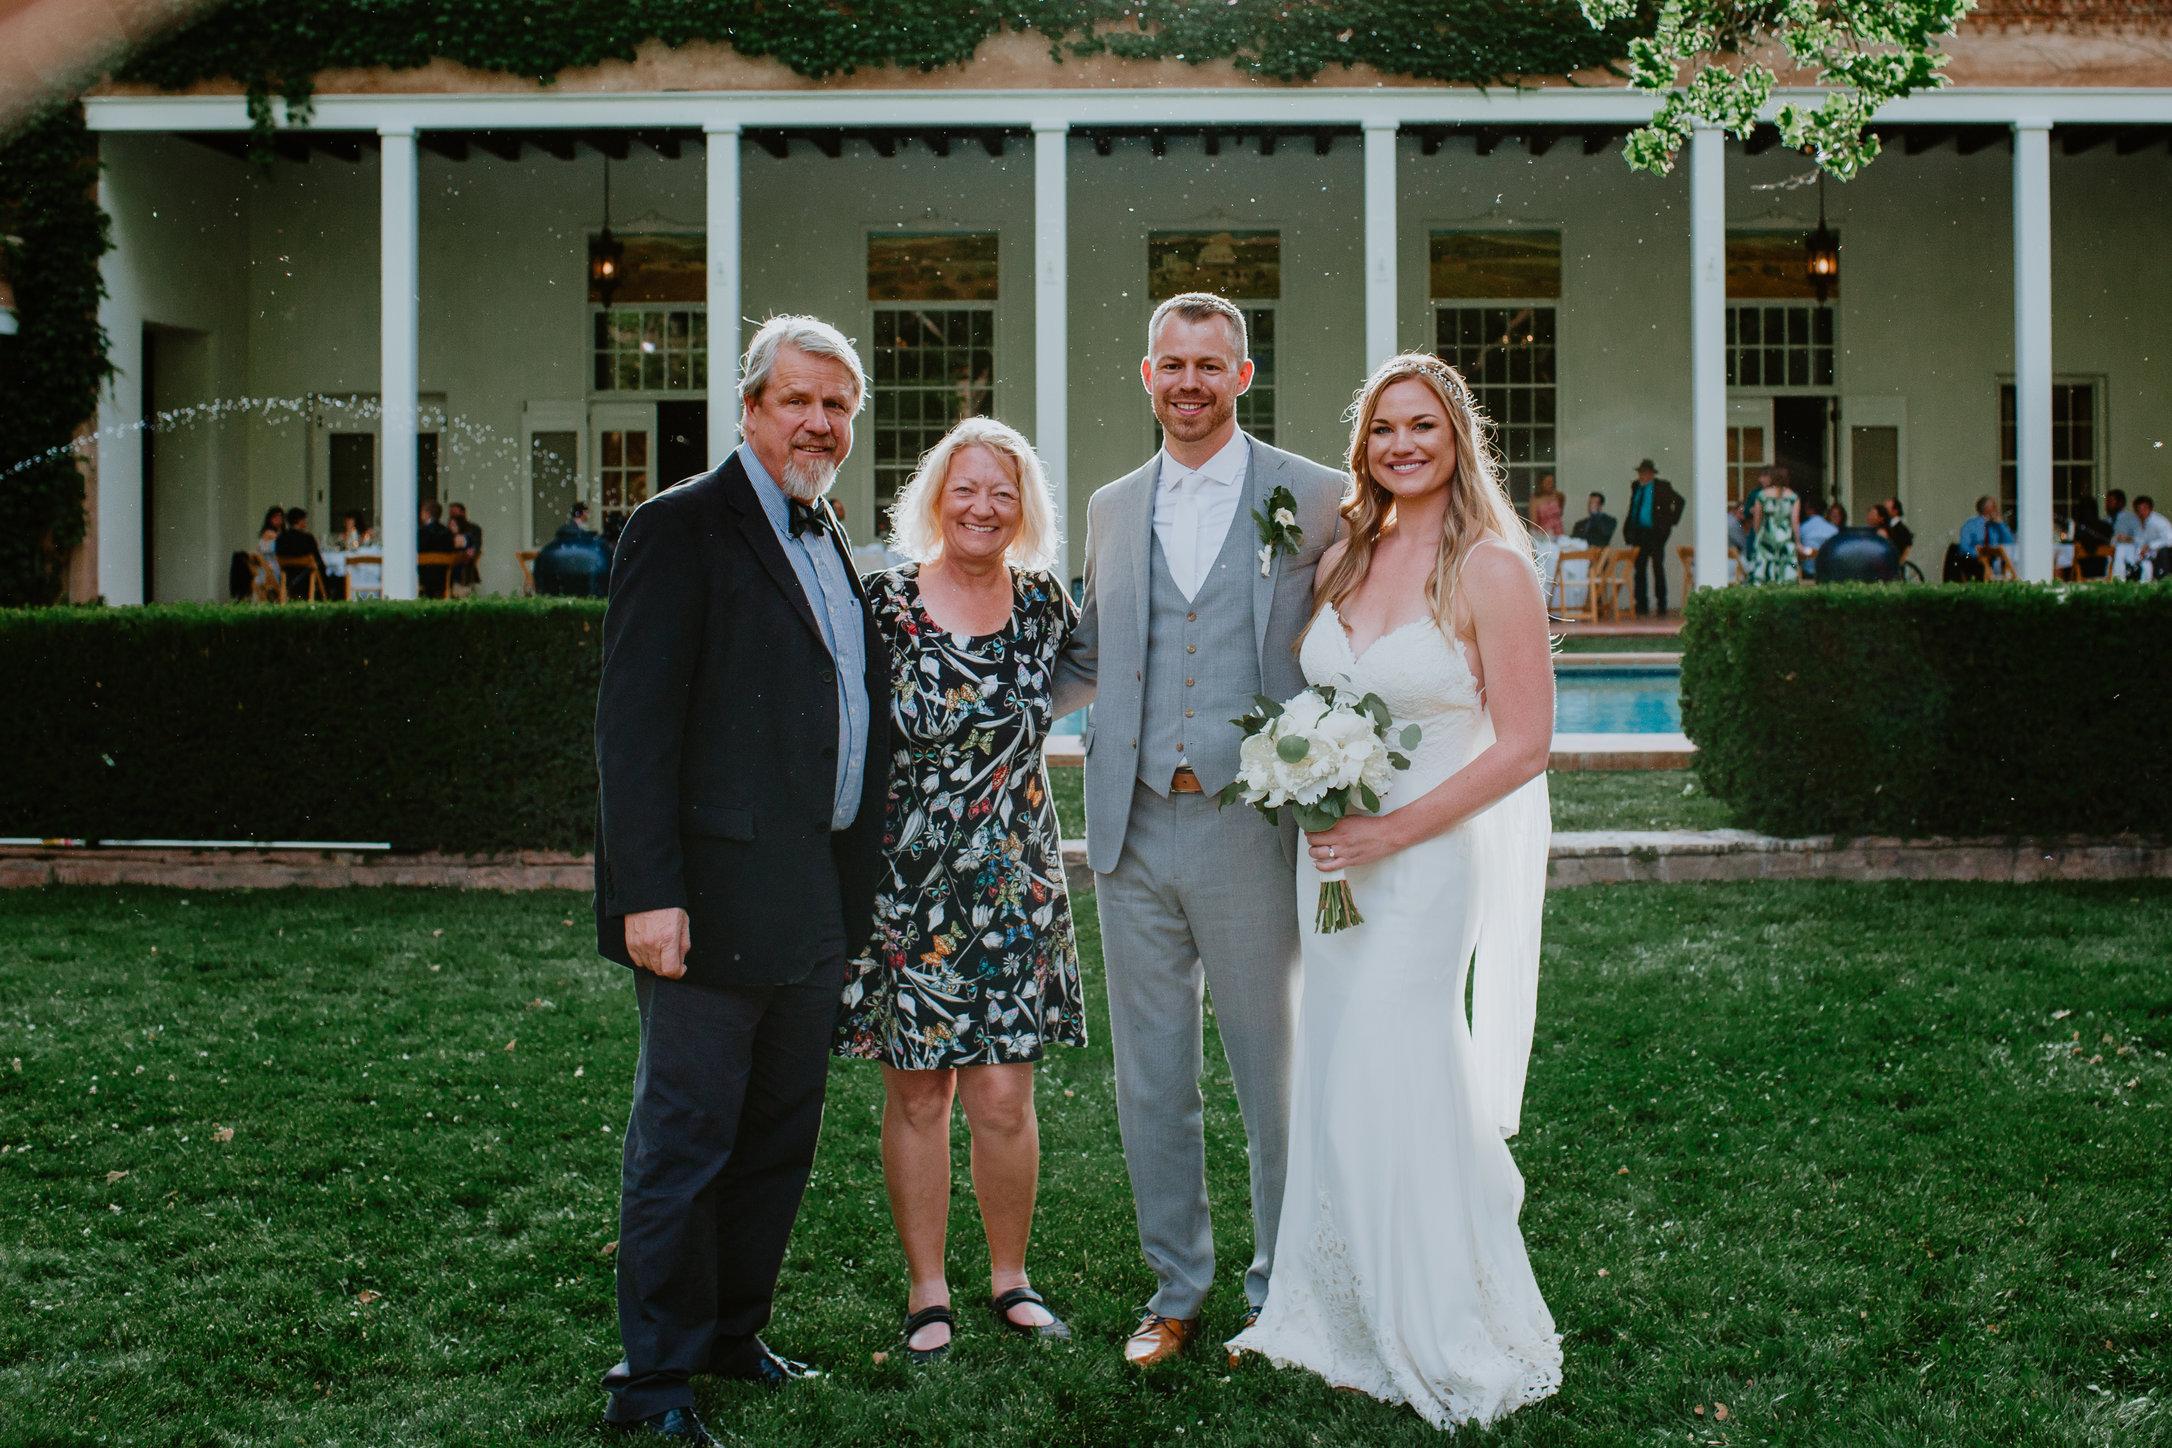 DandA-wedding-644.jpg